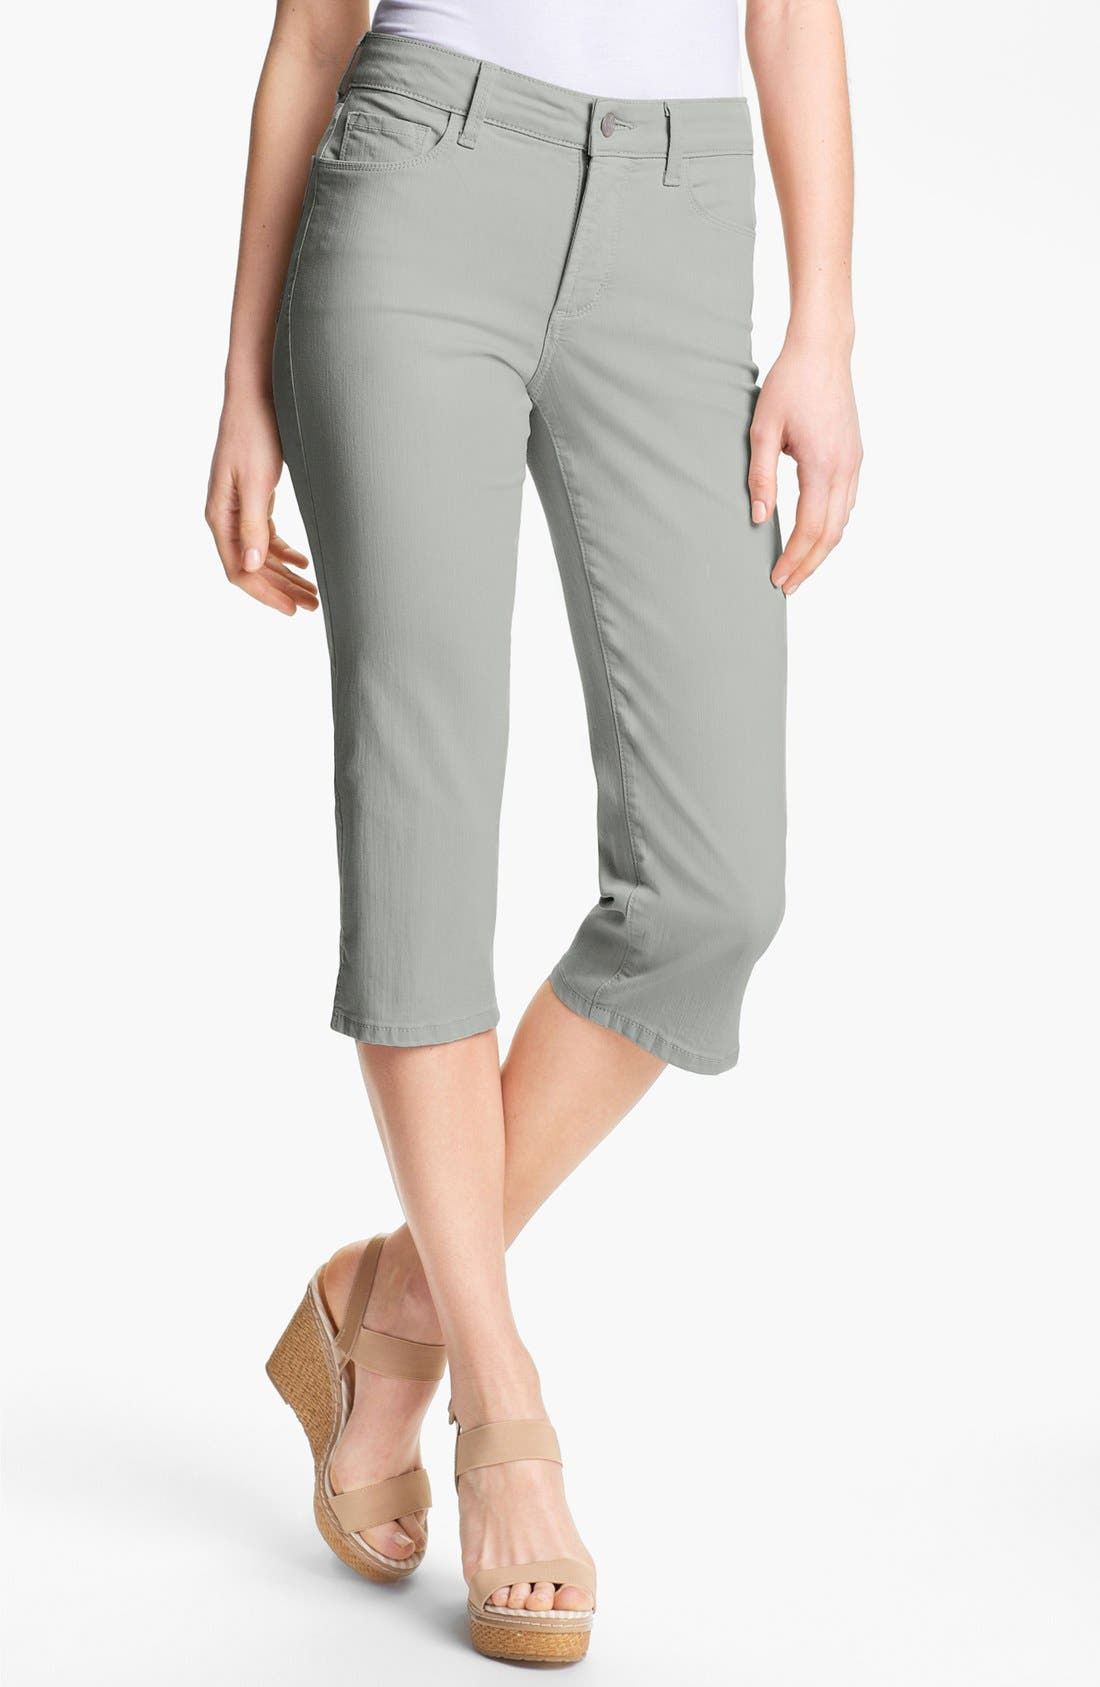 Alternate Image 1 Selected - NYDJ 'Nanette' Crop Stretch Jeans